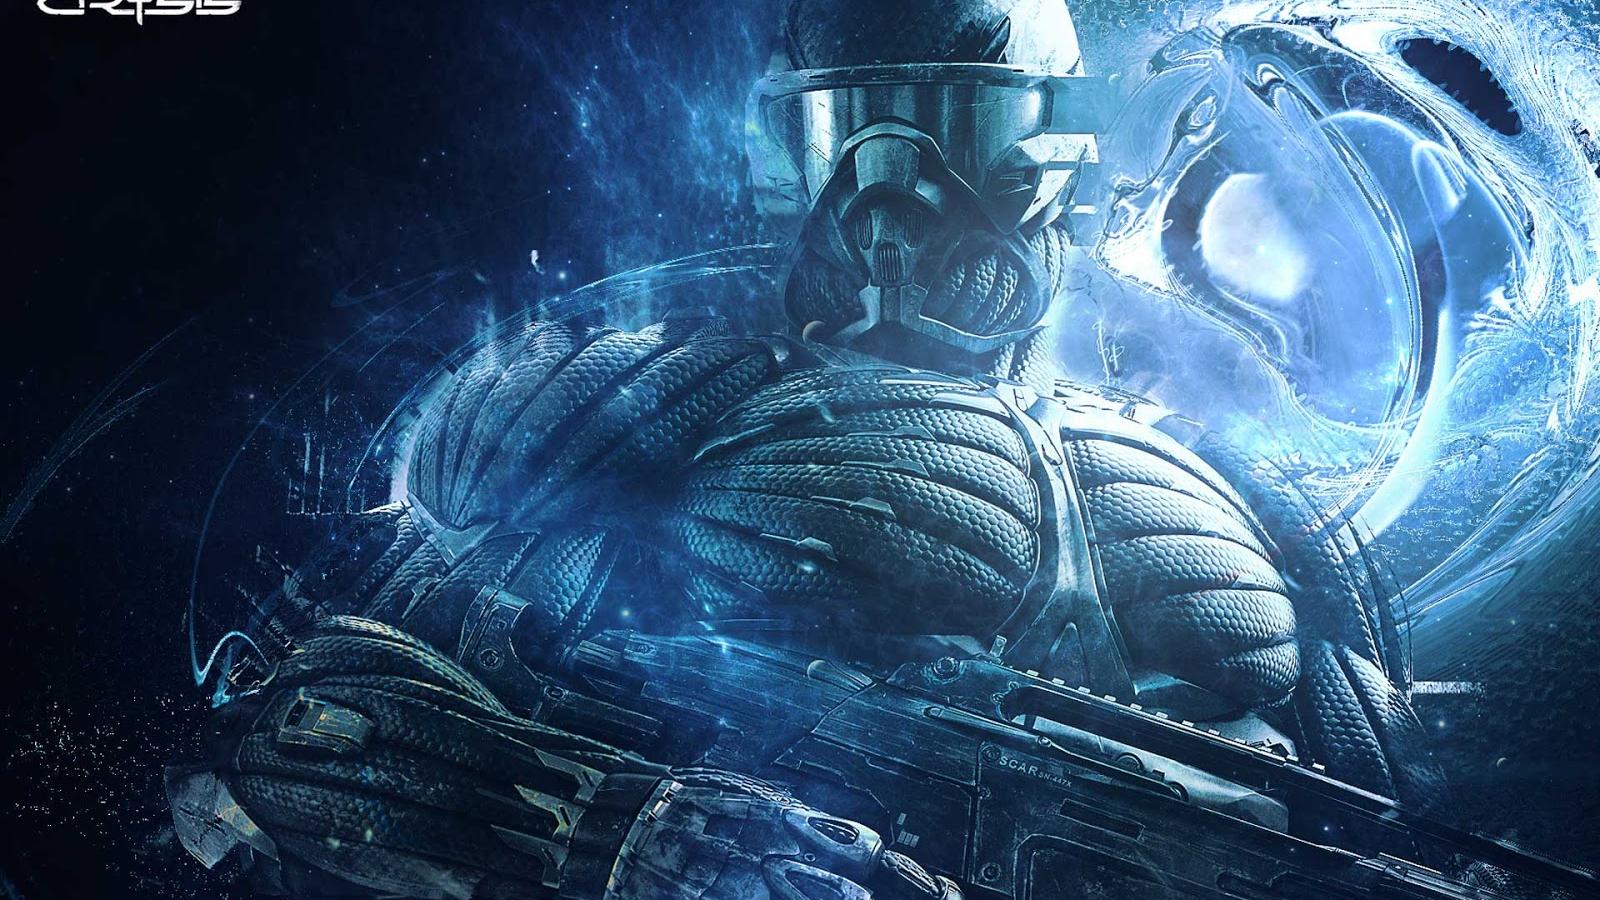 Free Download Hintergrundbilder Hd Crysis 3 Pc Wallpaper